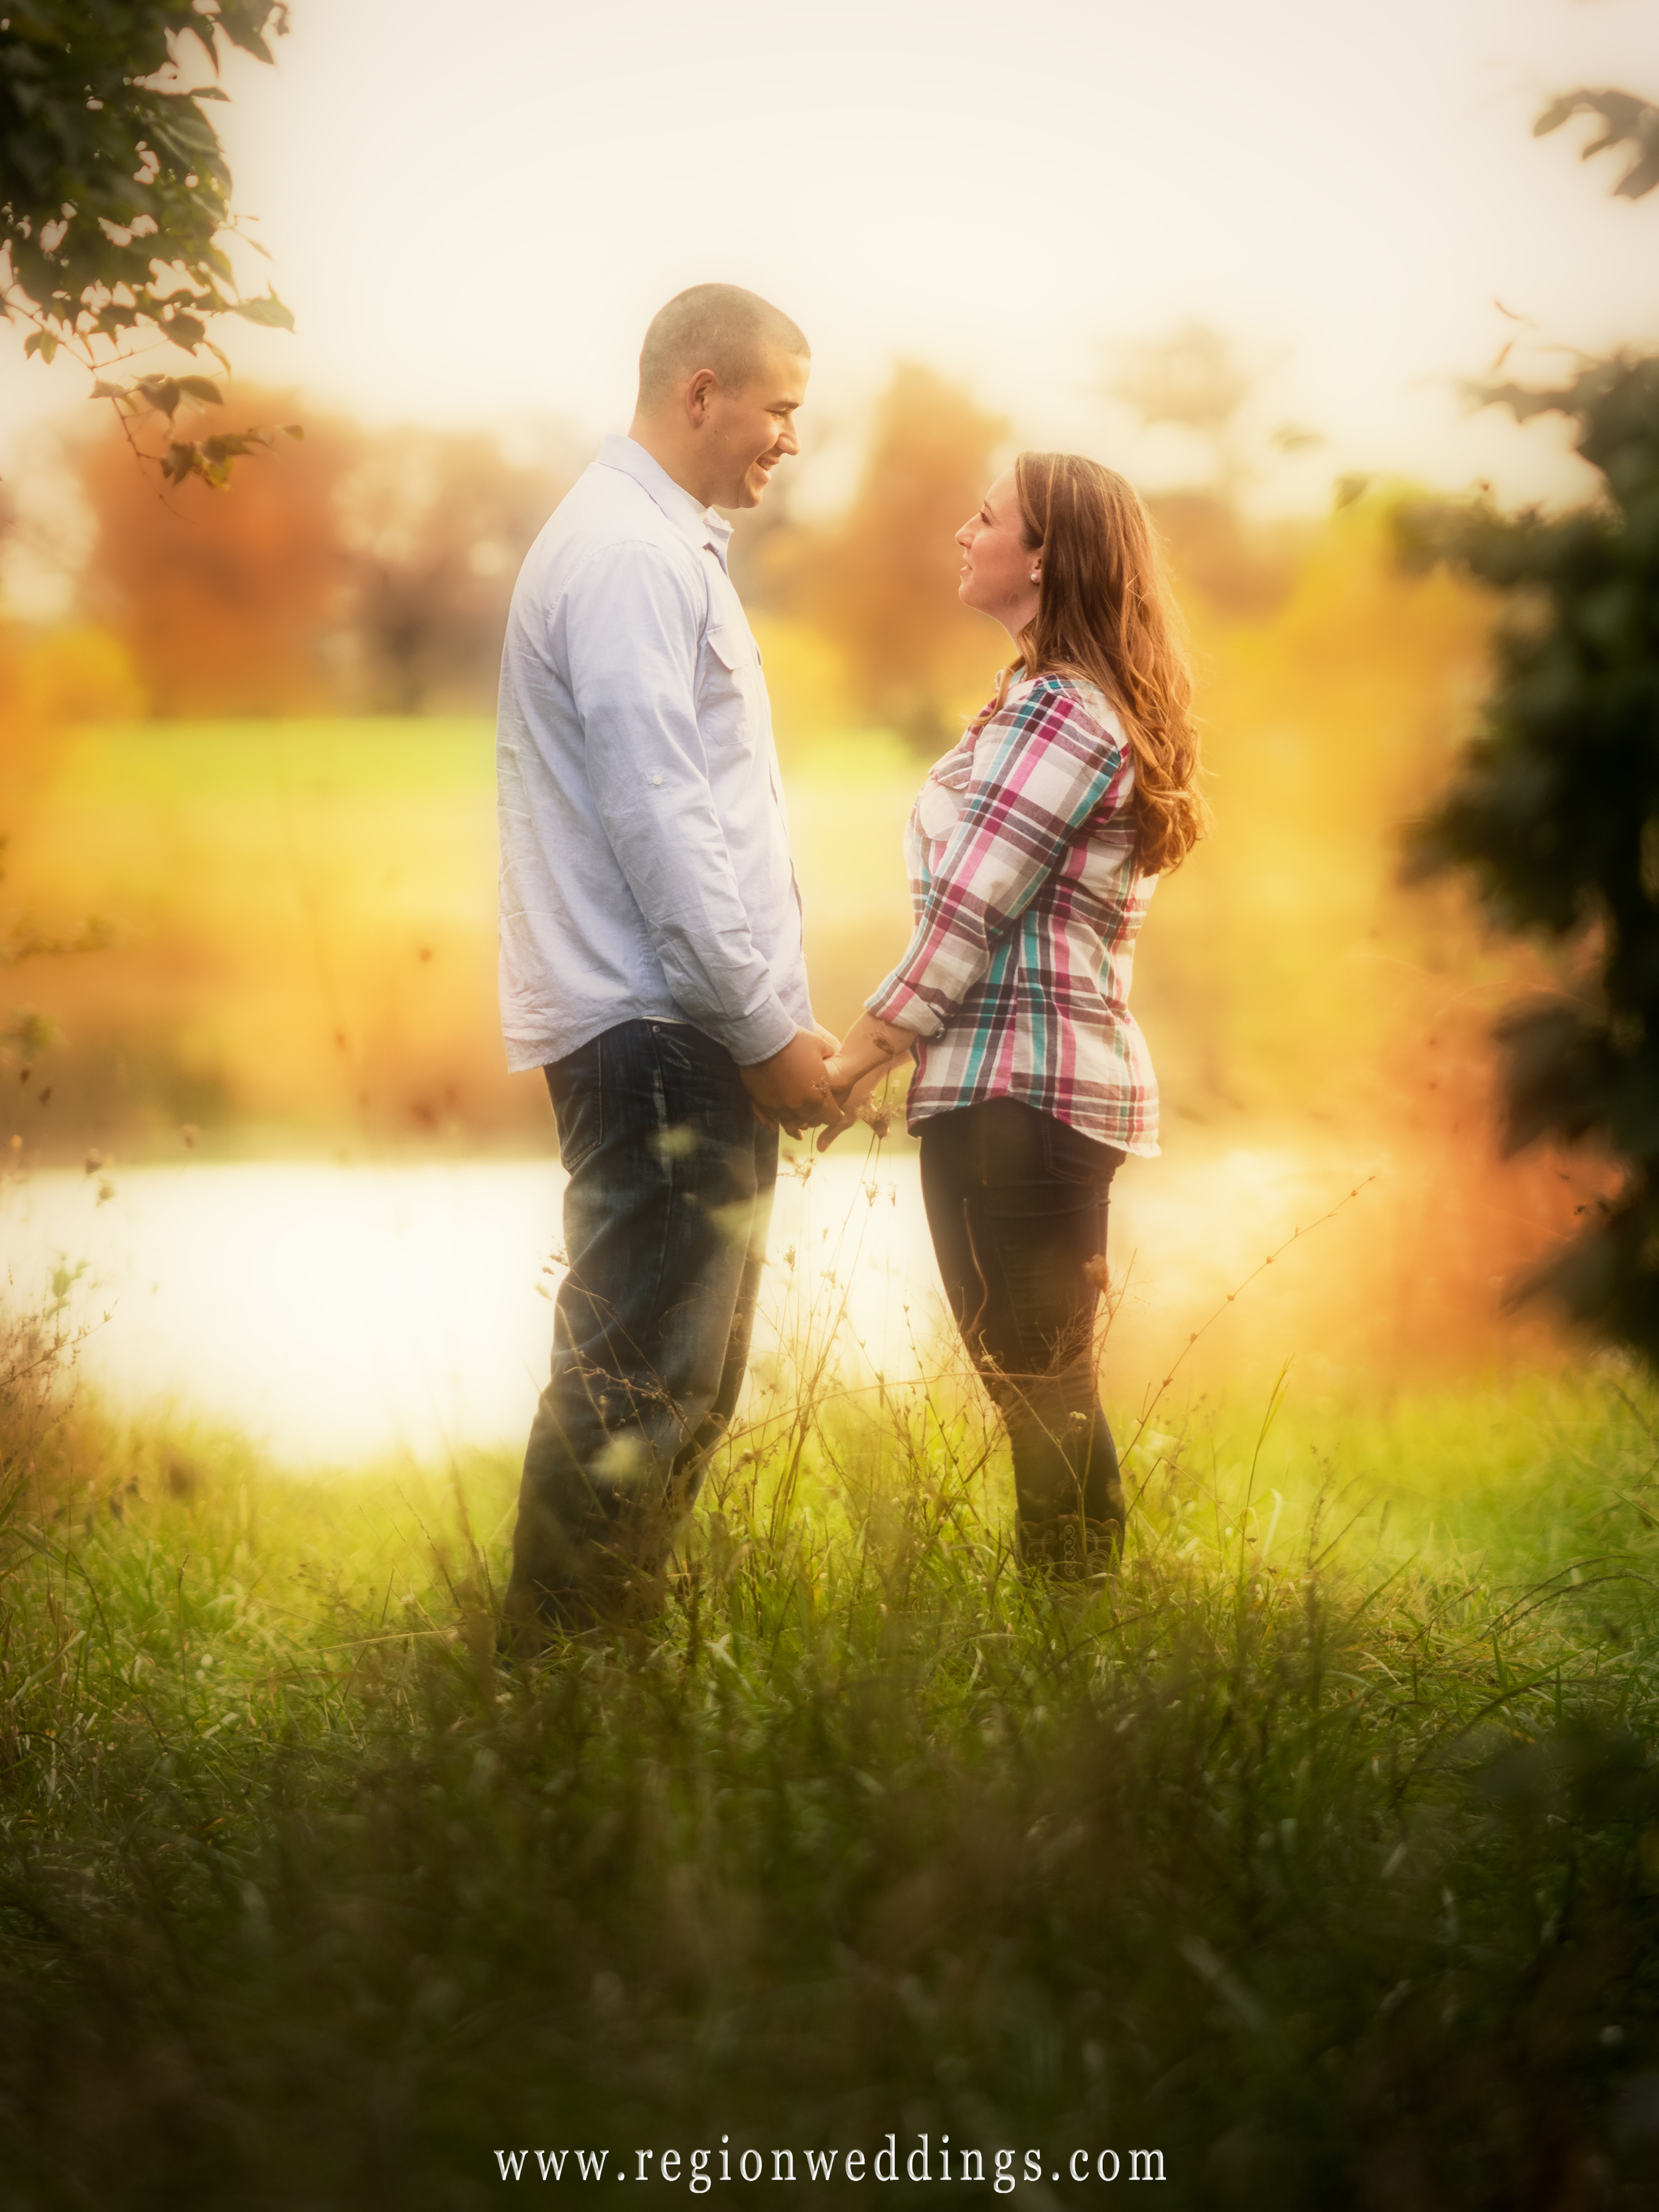 A romantic natural light engagement photo shot in soft focus.